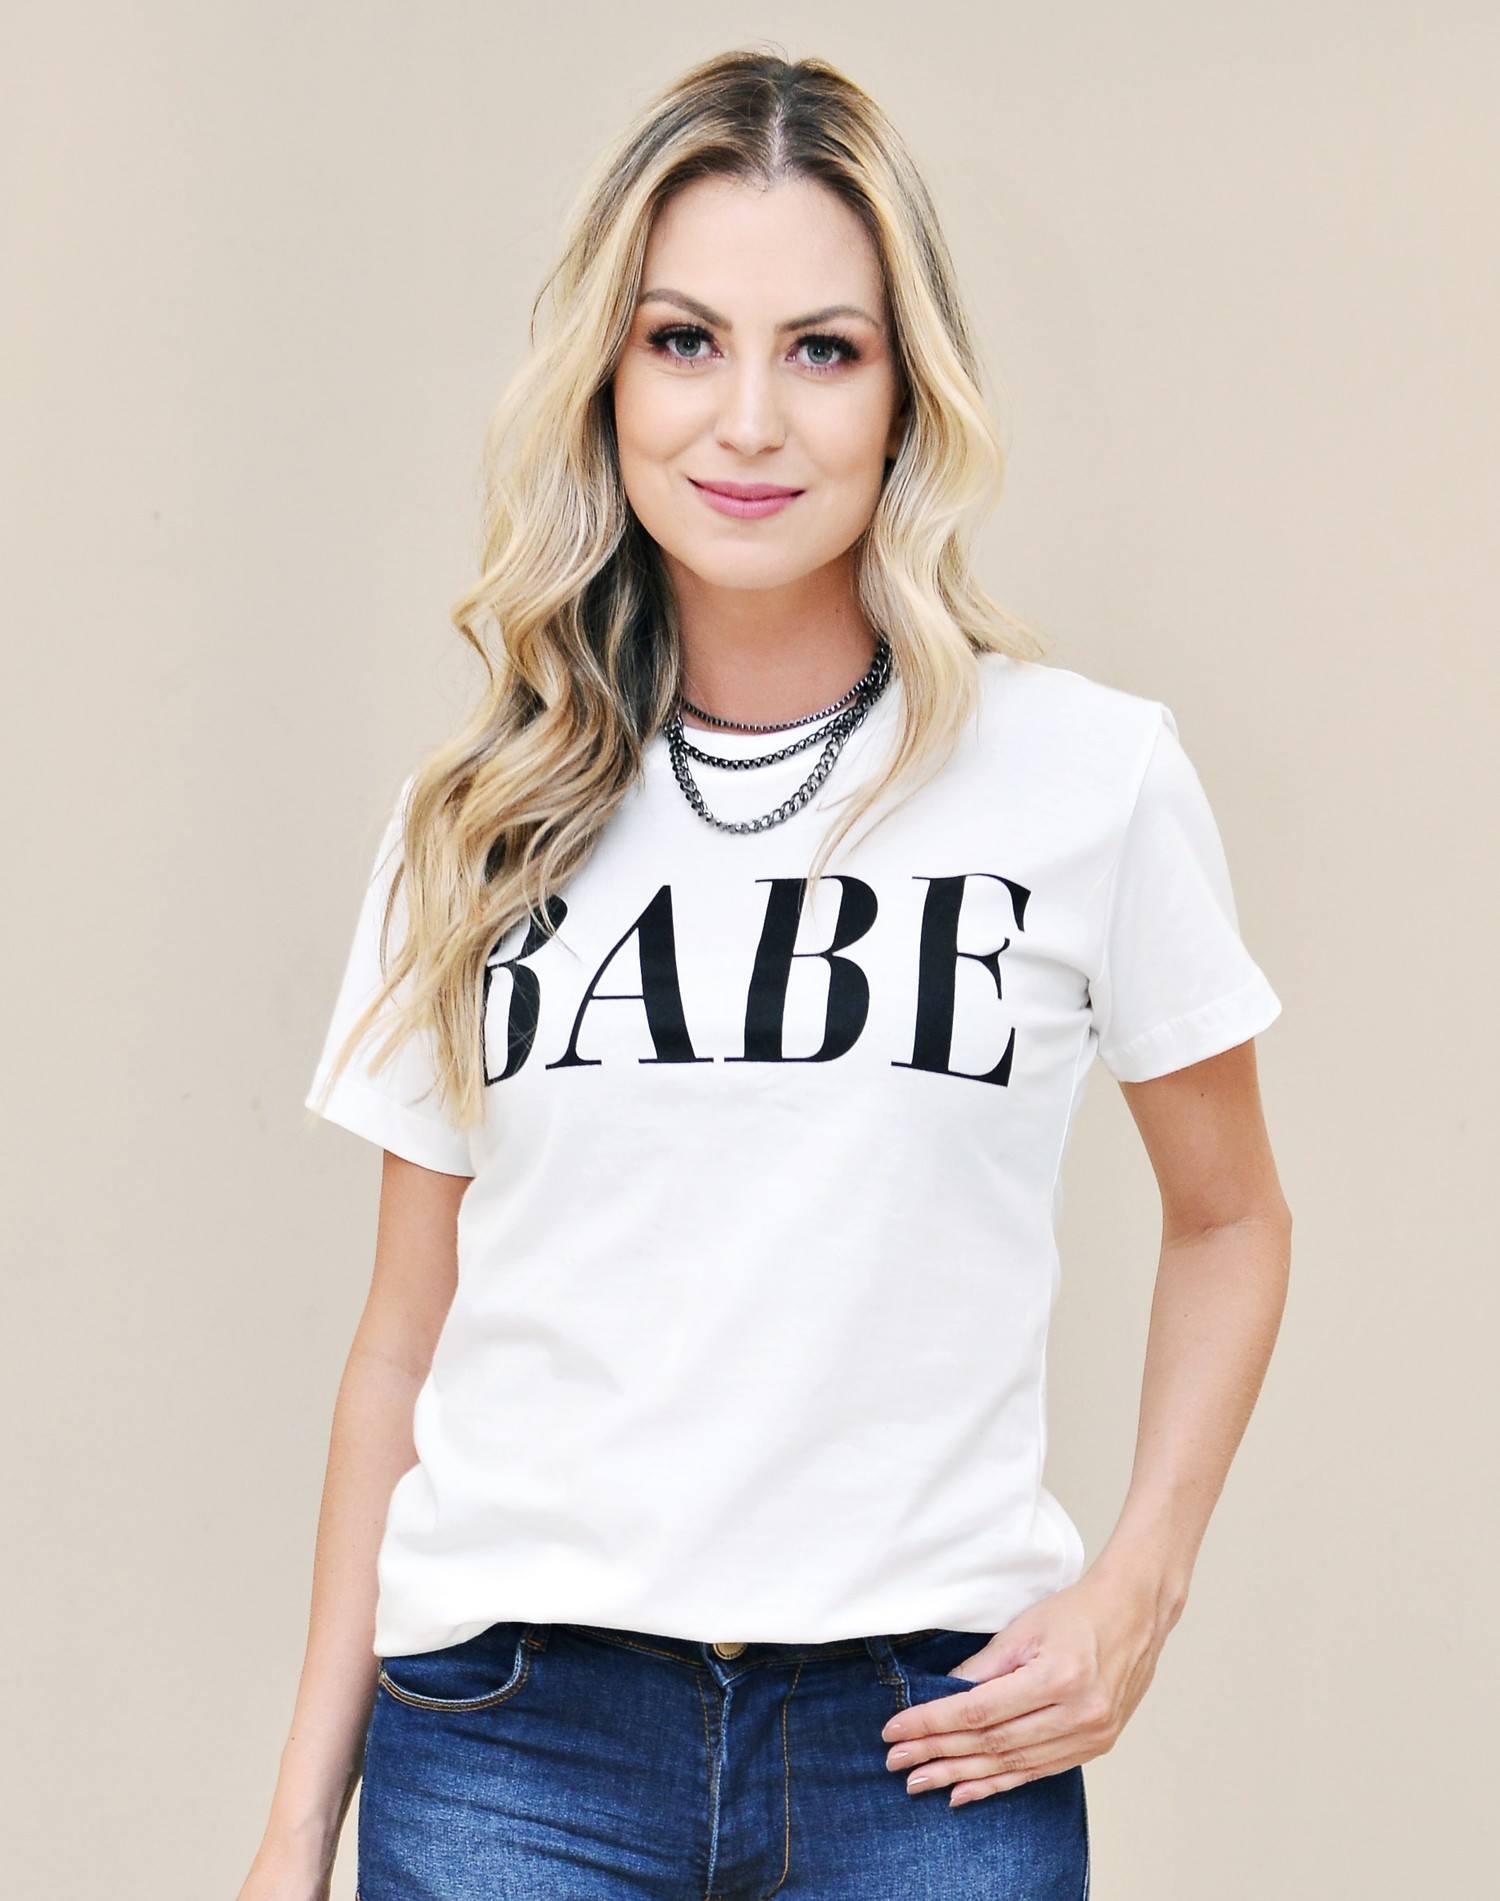 T-shirt Babe Nathalie Ferrier